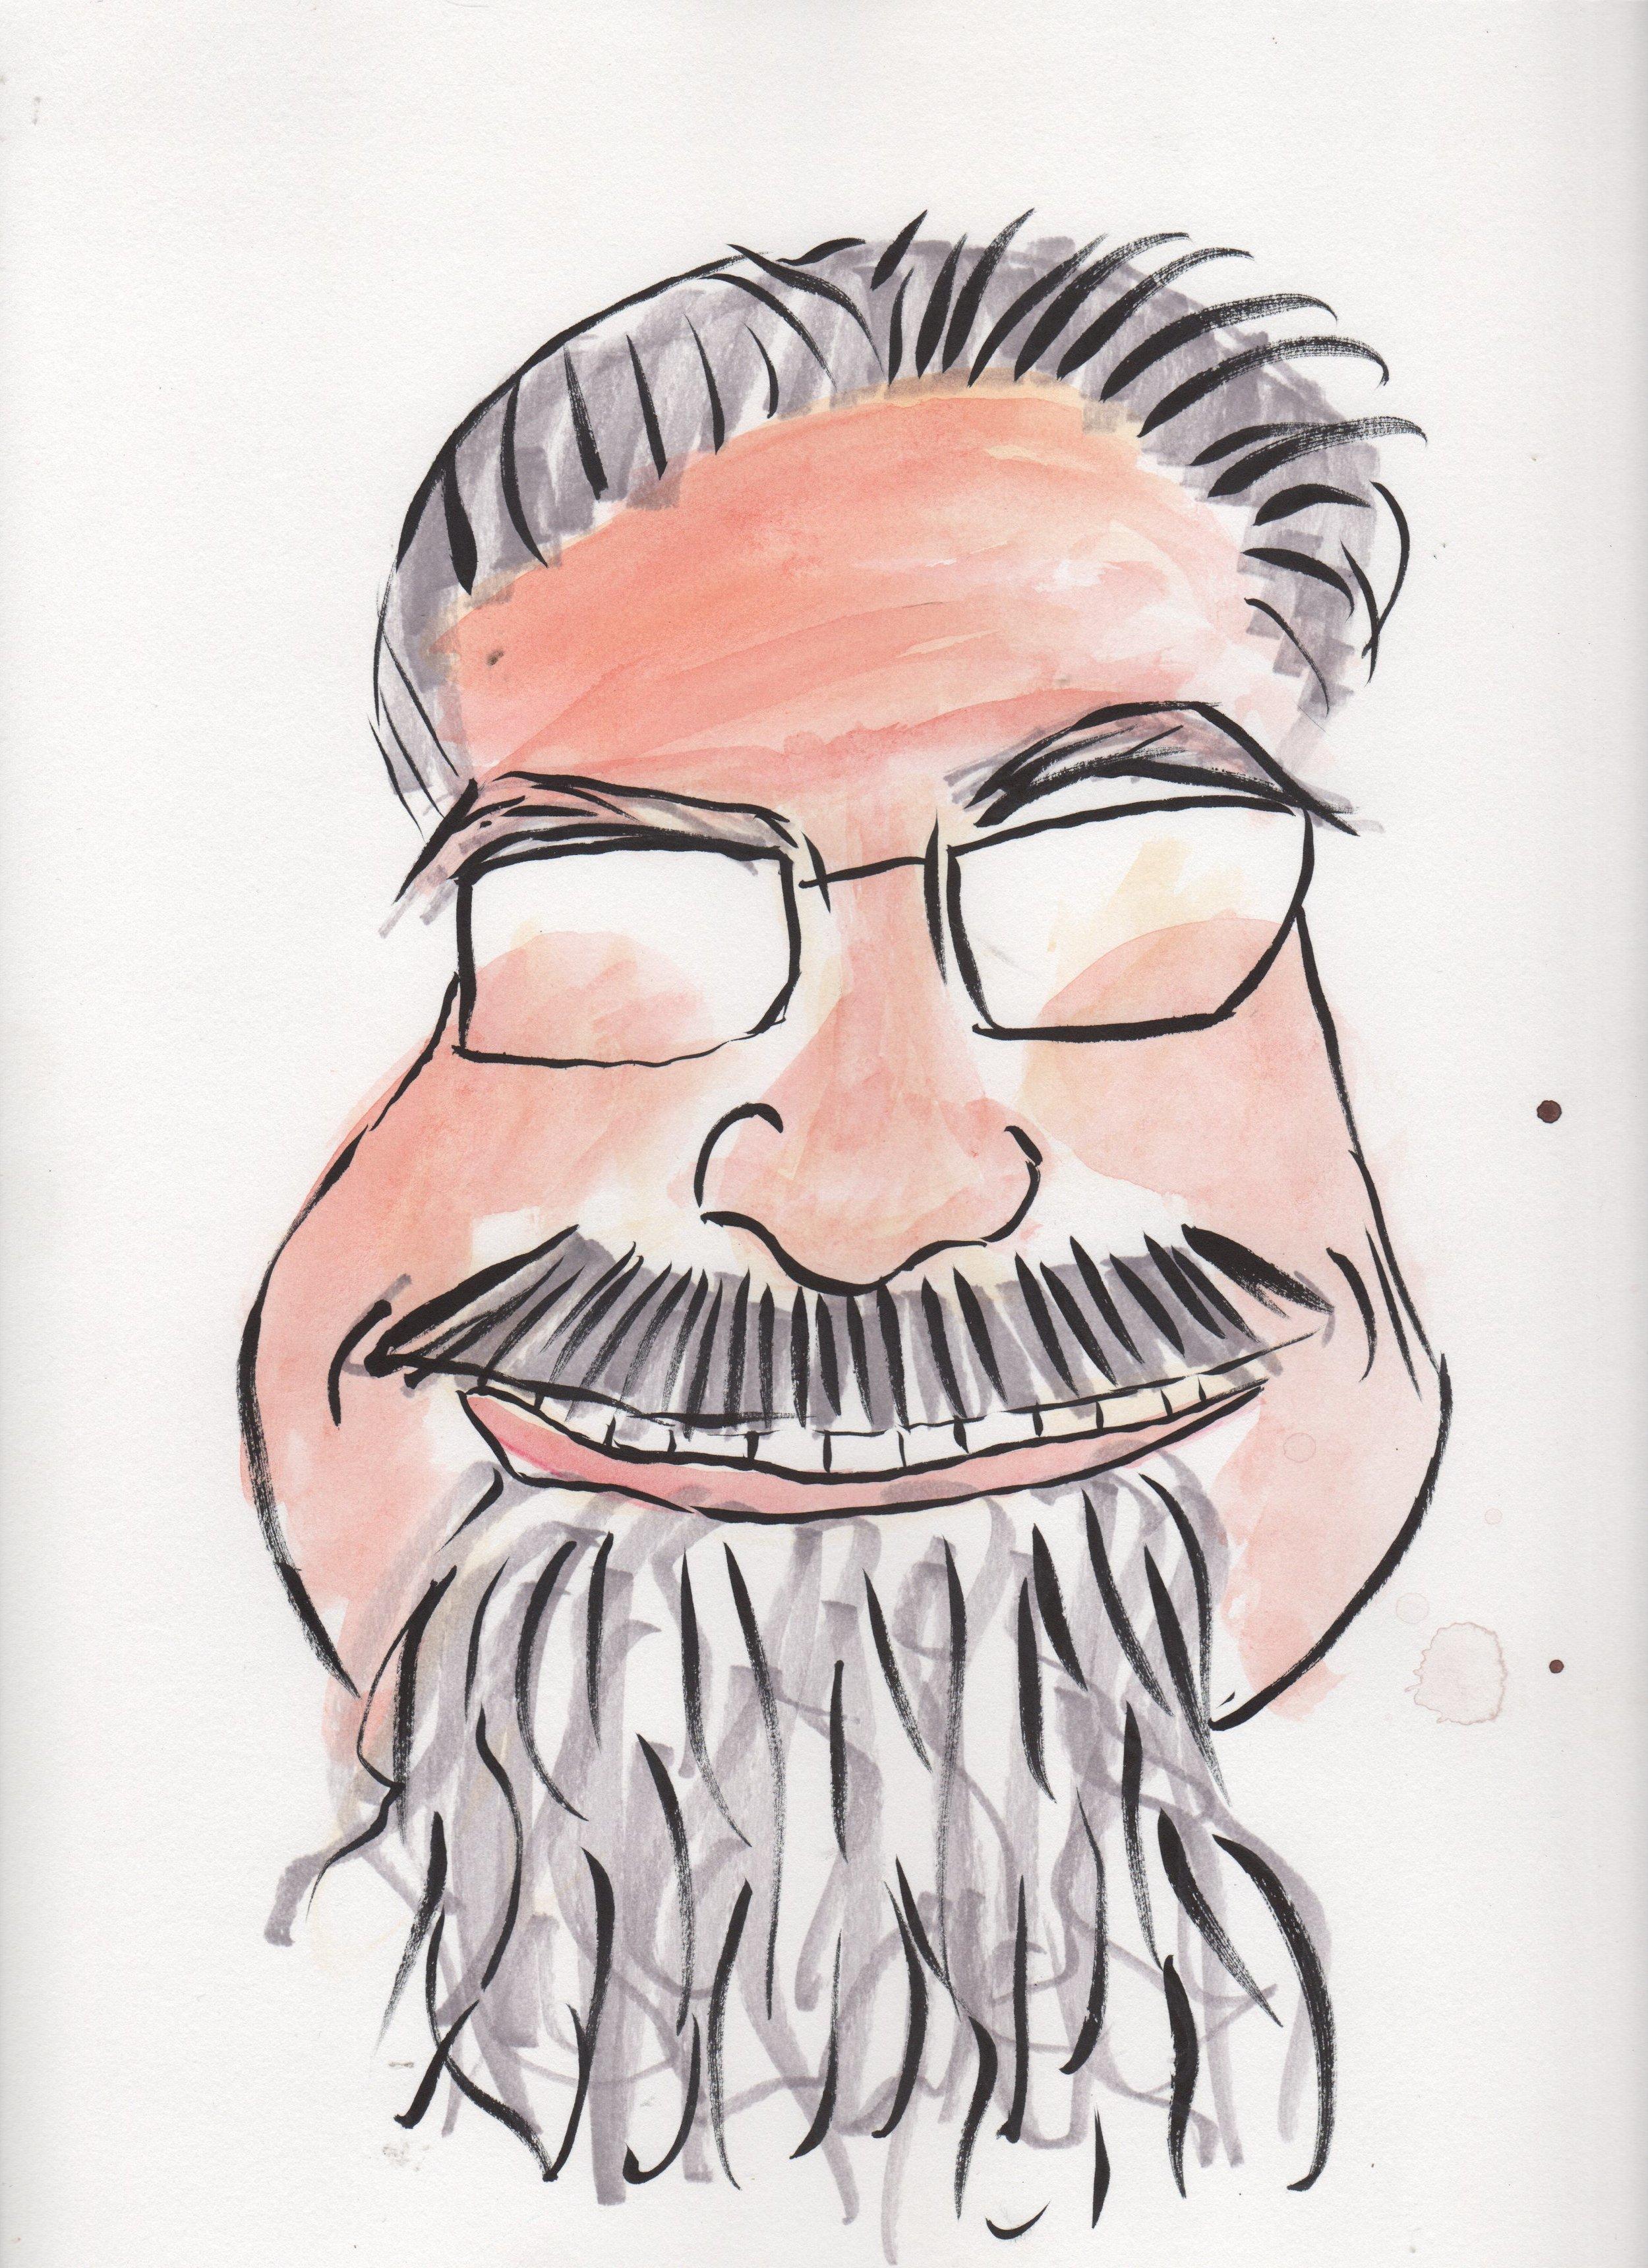 caricature005.jpg